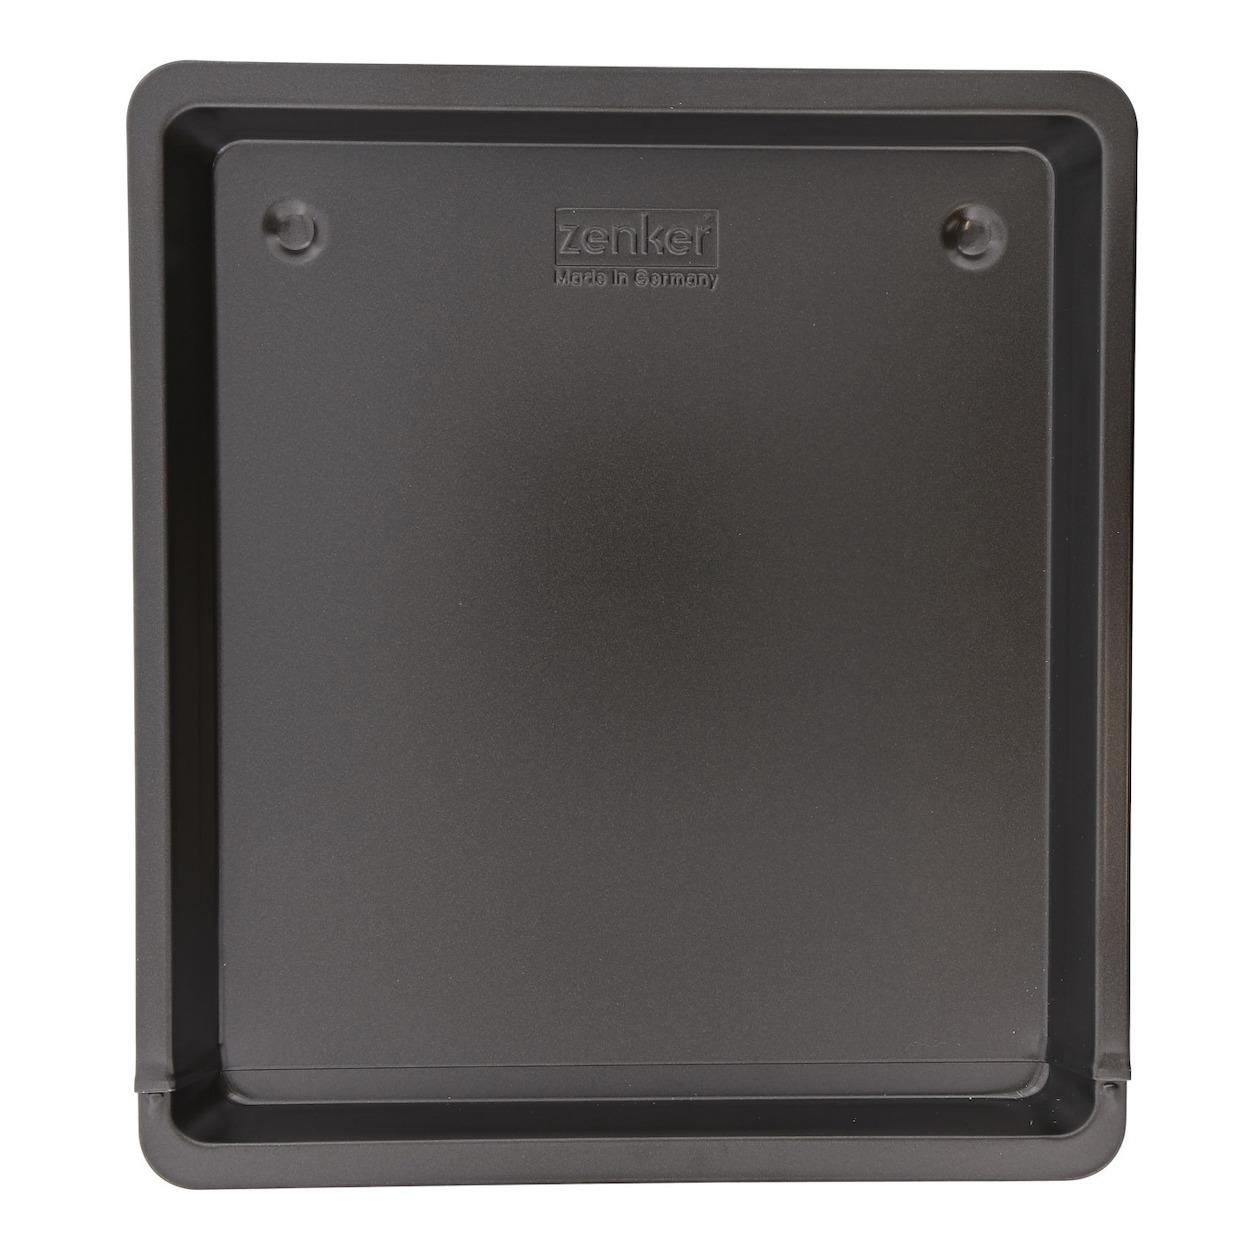 Electrolux oven accessoire E40HBAE1